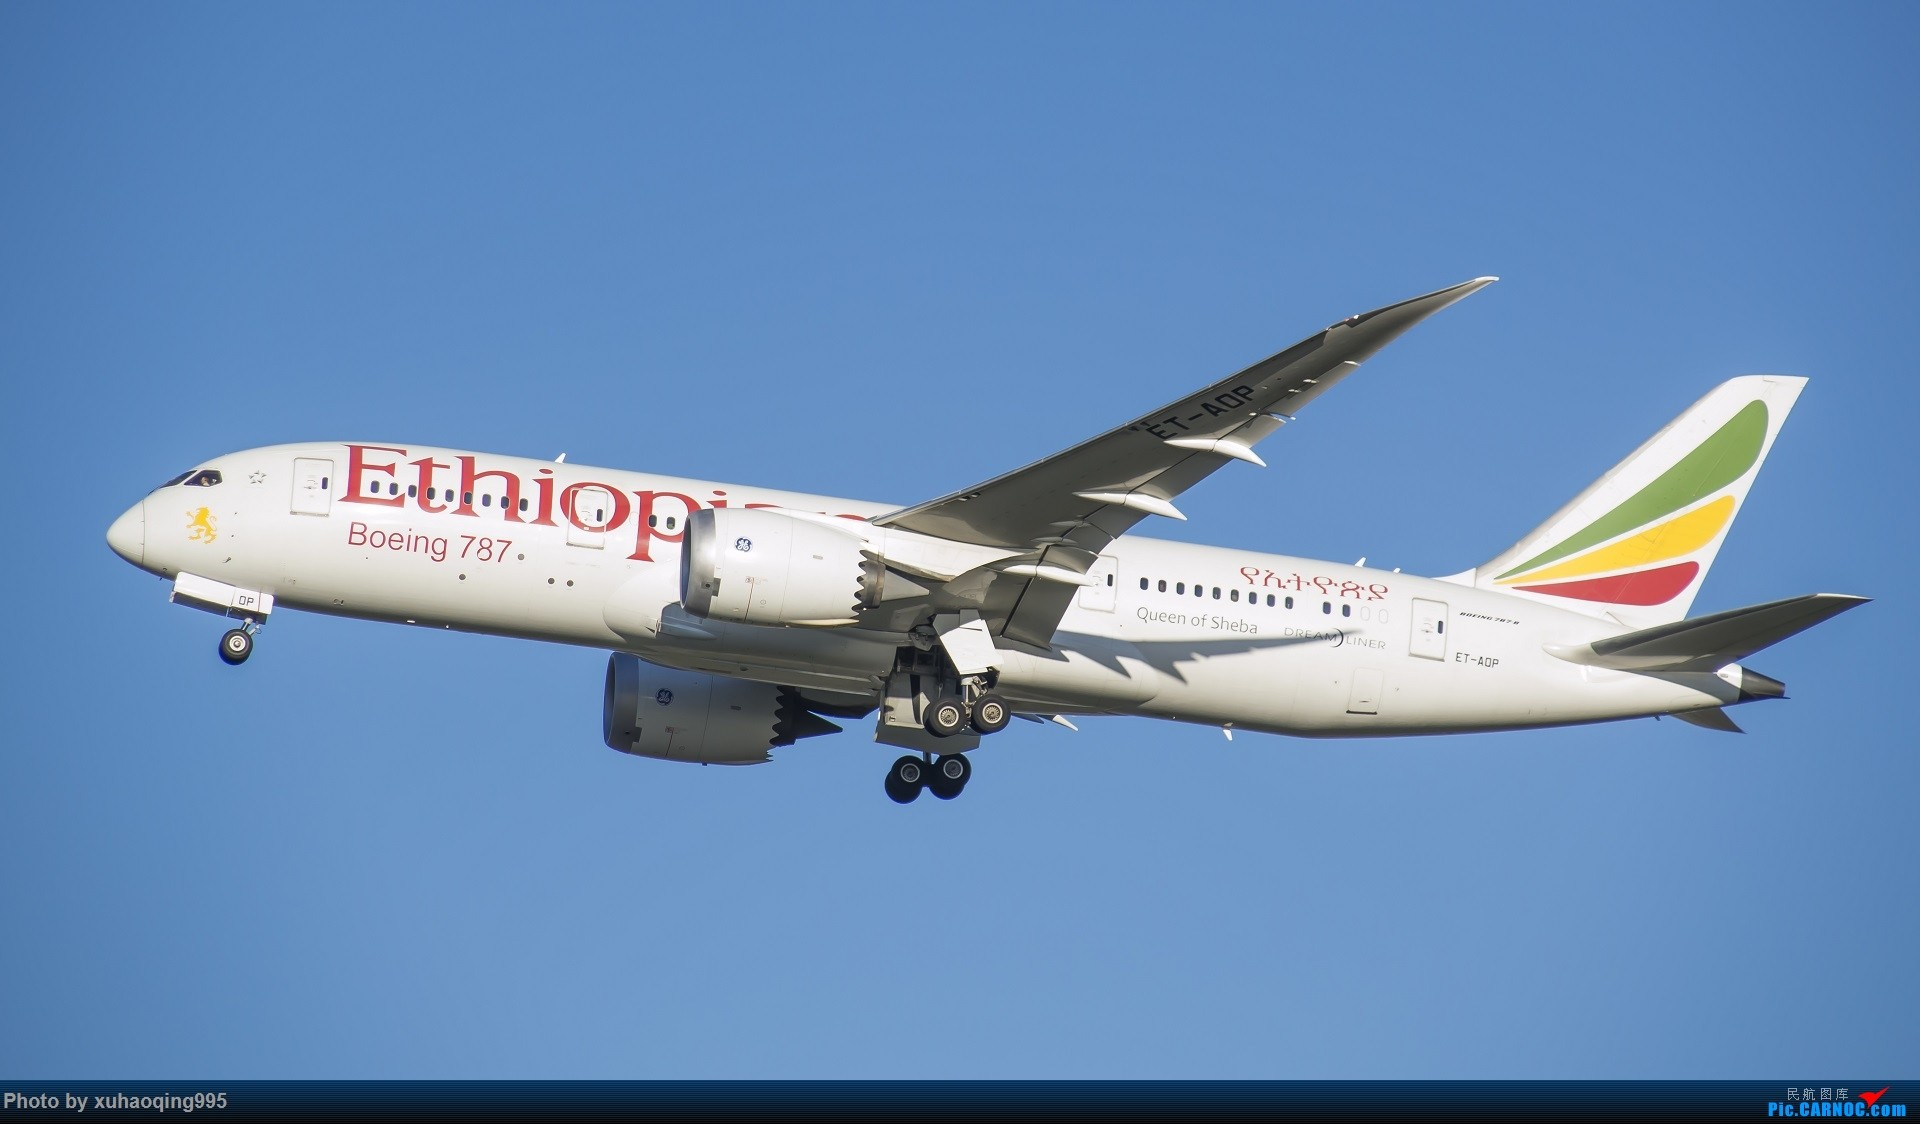 Re:[原创]罗马机场(FCO)拍机 BOEING 787-8 ET-AOP 意大利菲乌米奇诺机场